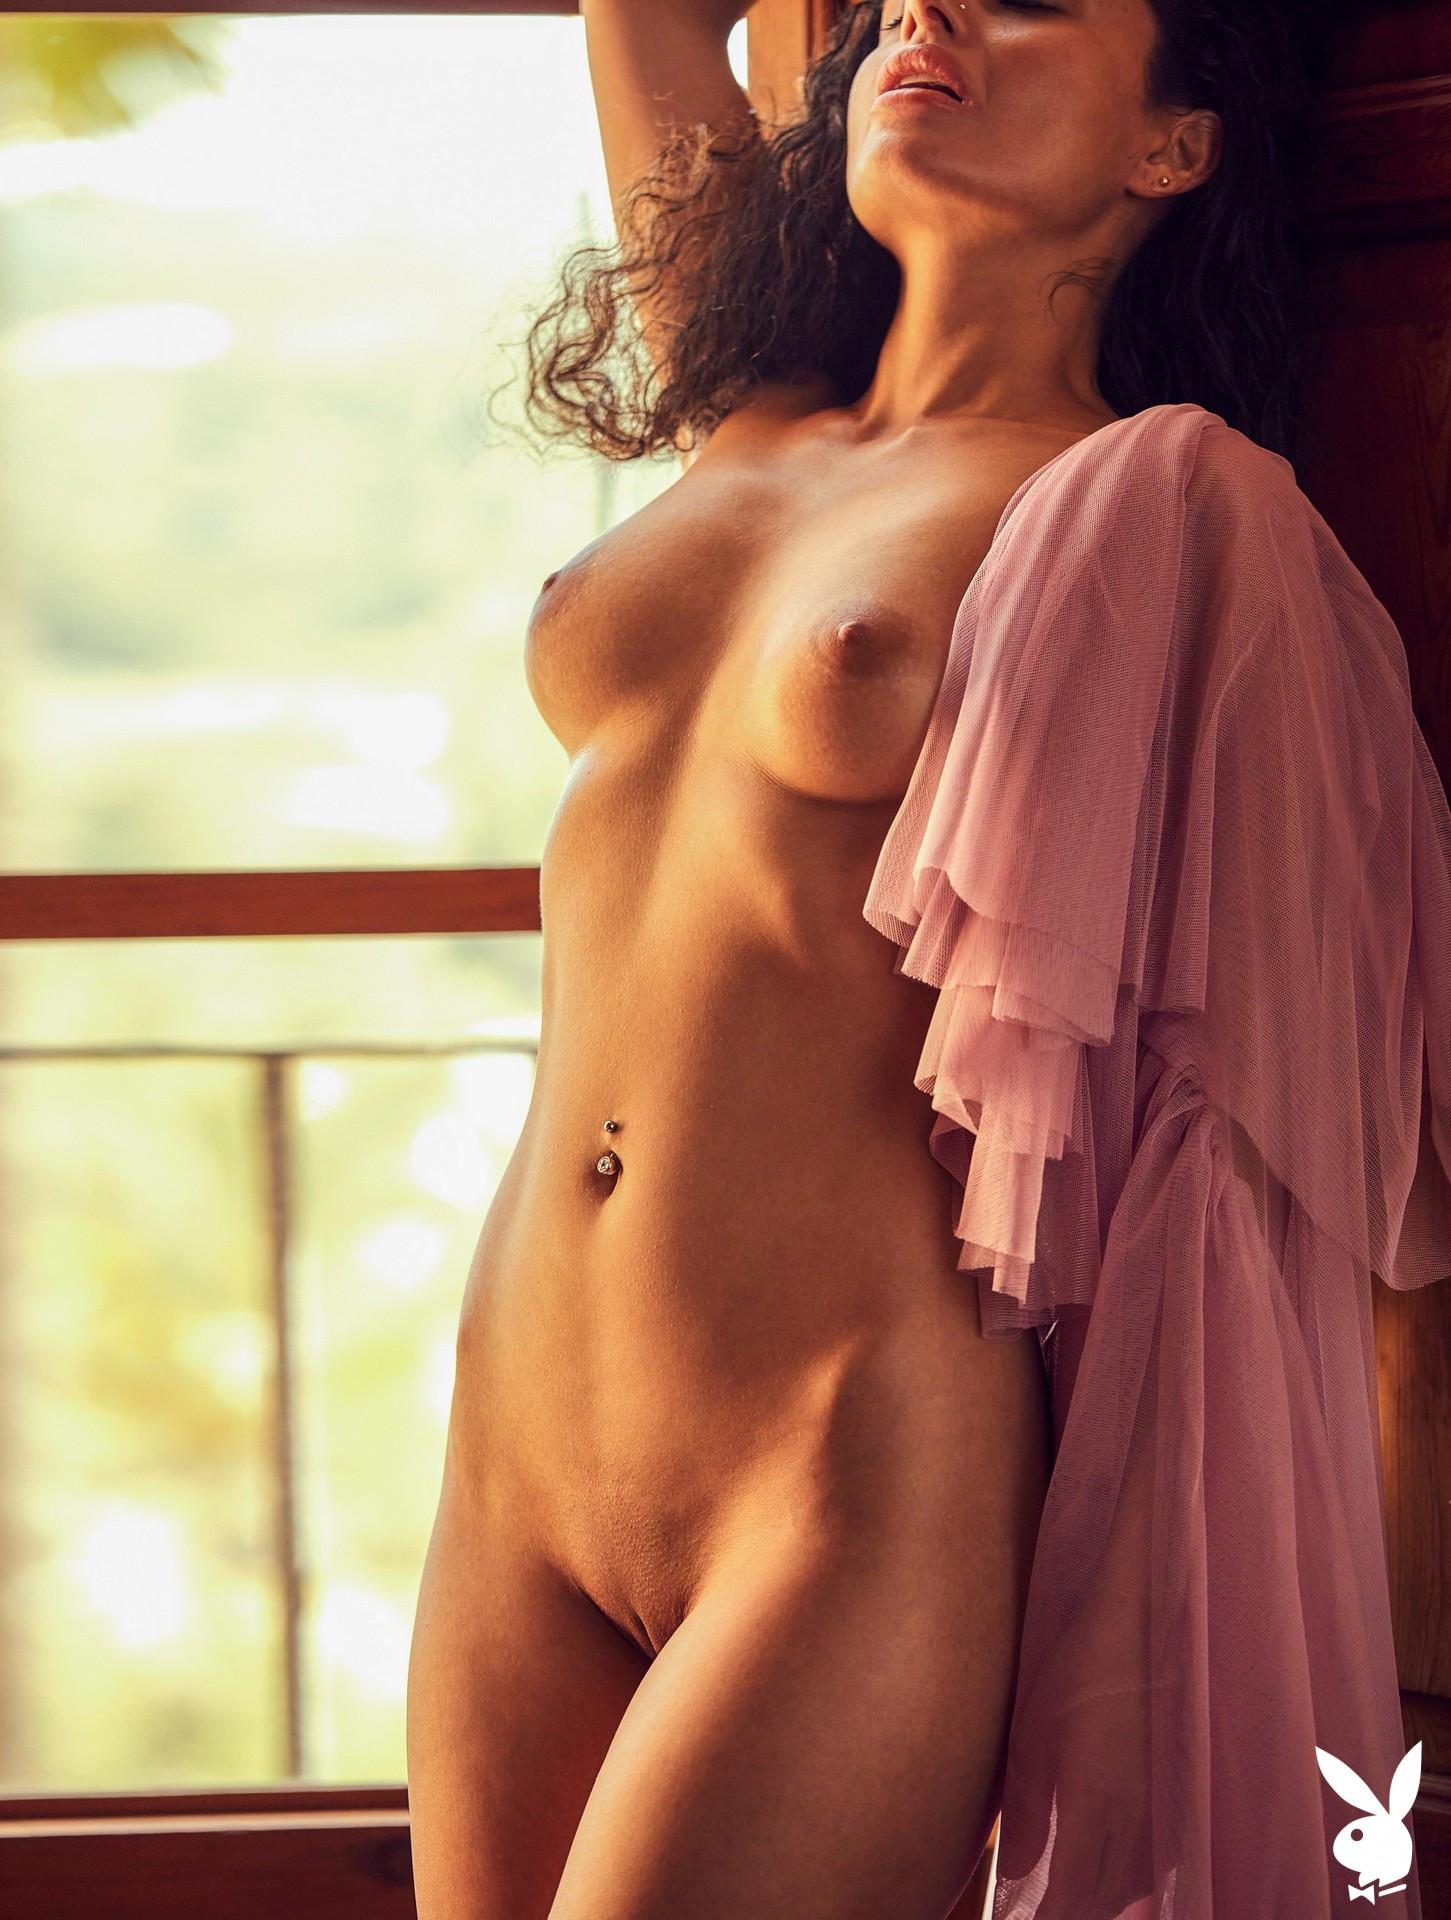 Bana Hamawandi In Playboy Germany Playboy Plus (5)